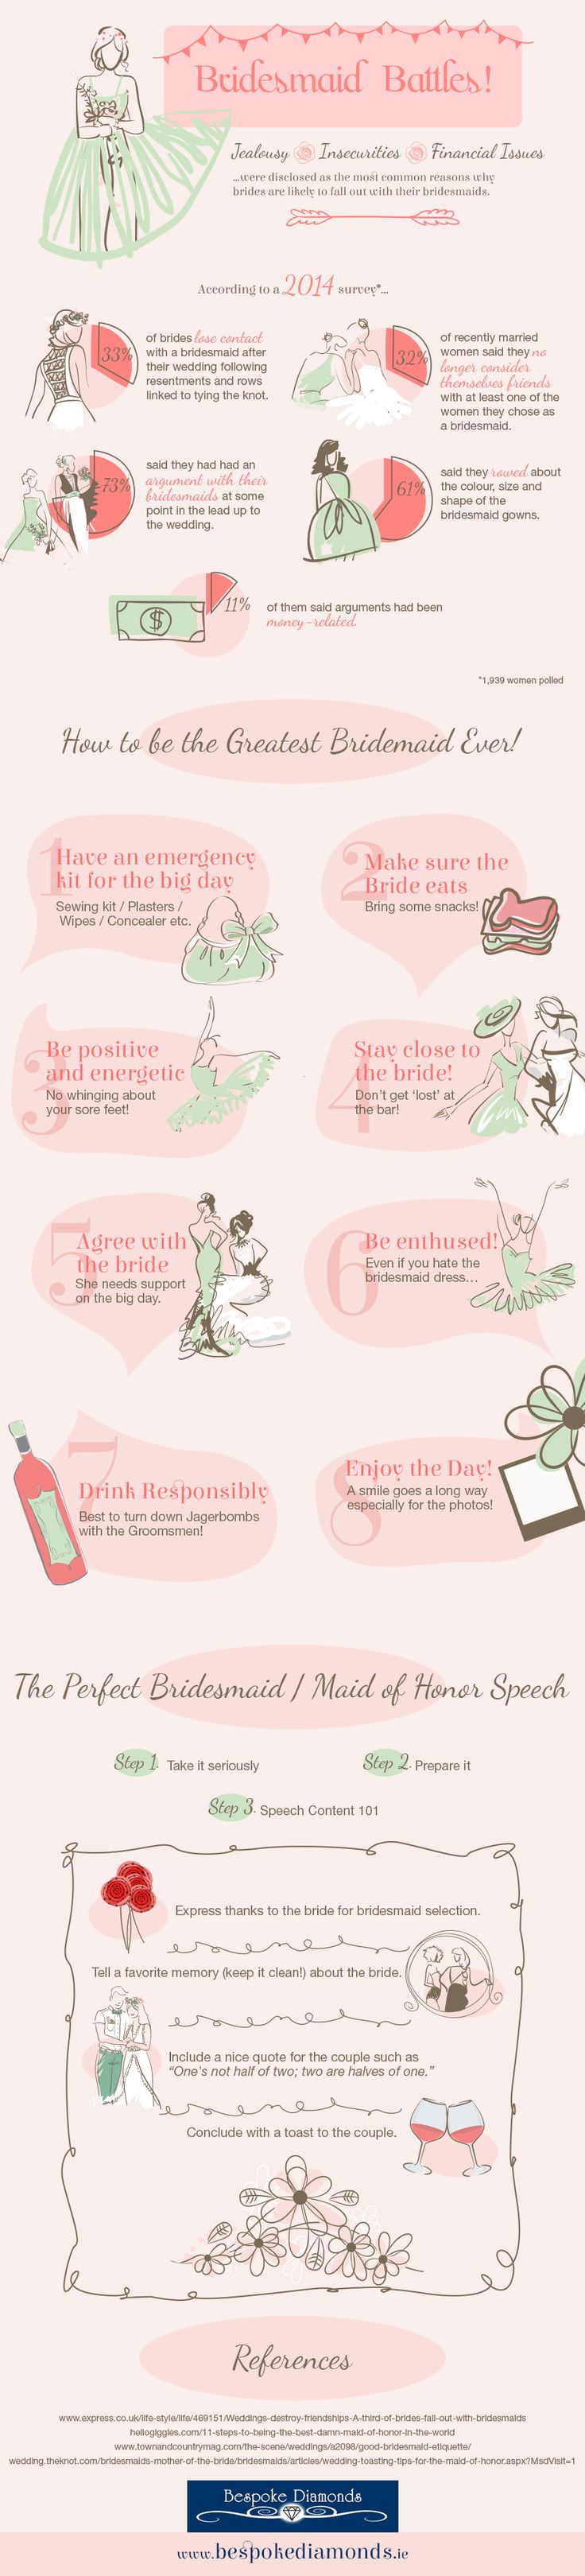 Bespoke-Bridesmaid-Battles-Infographic